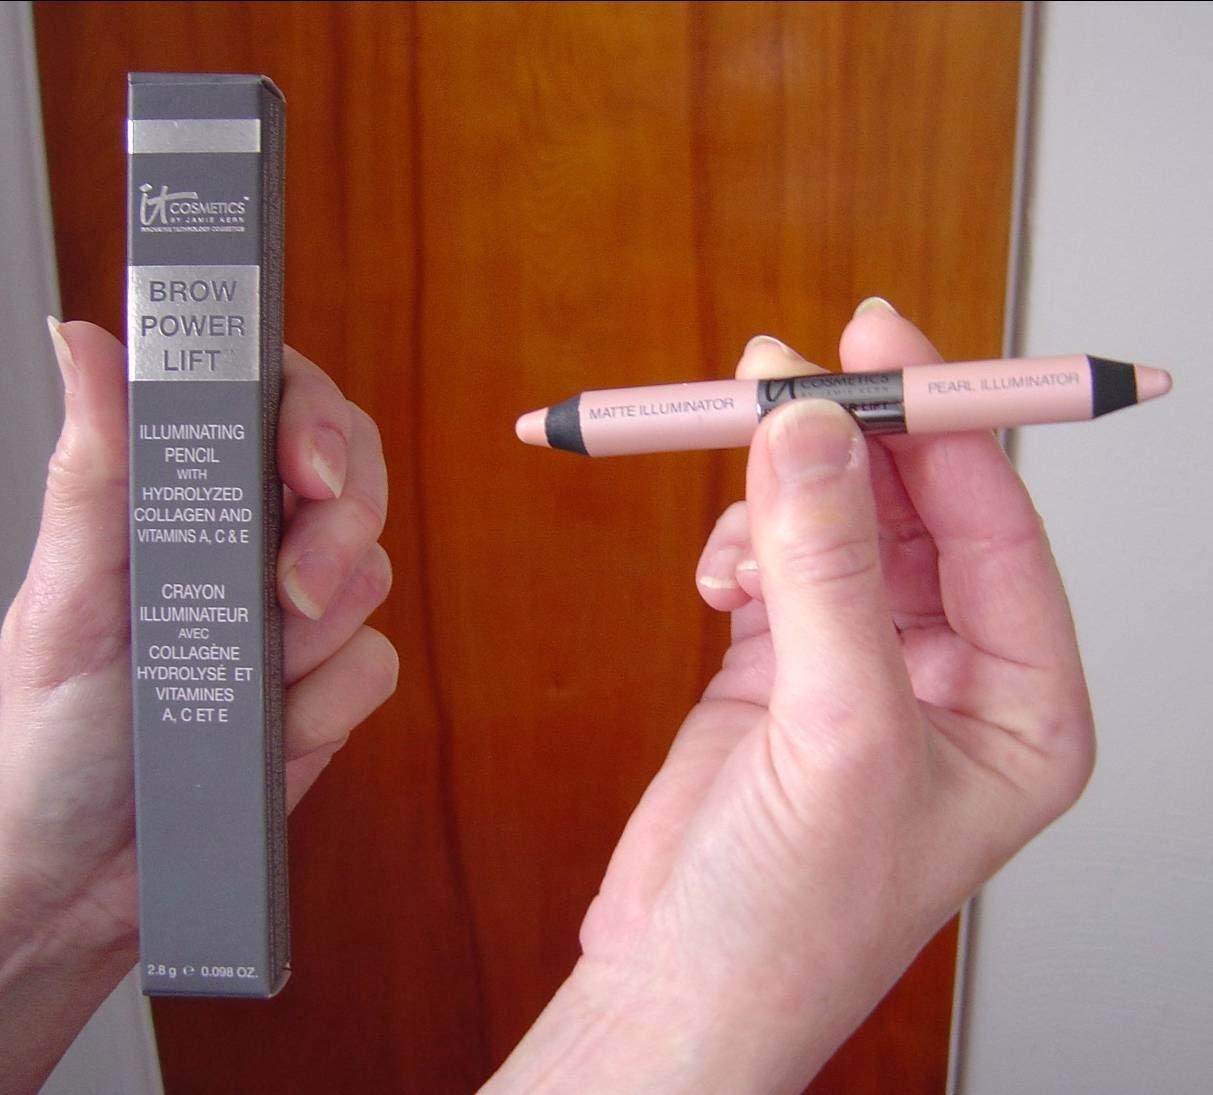 IT Cosmetics Brow Power Lift Pencil.jpeg